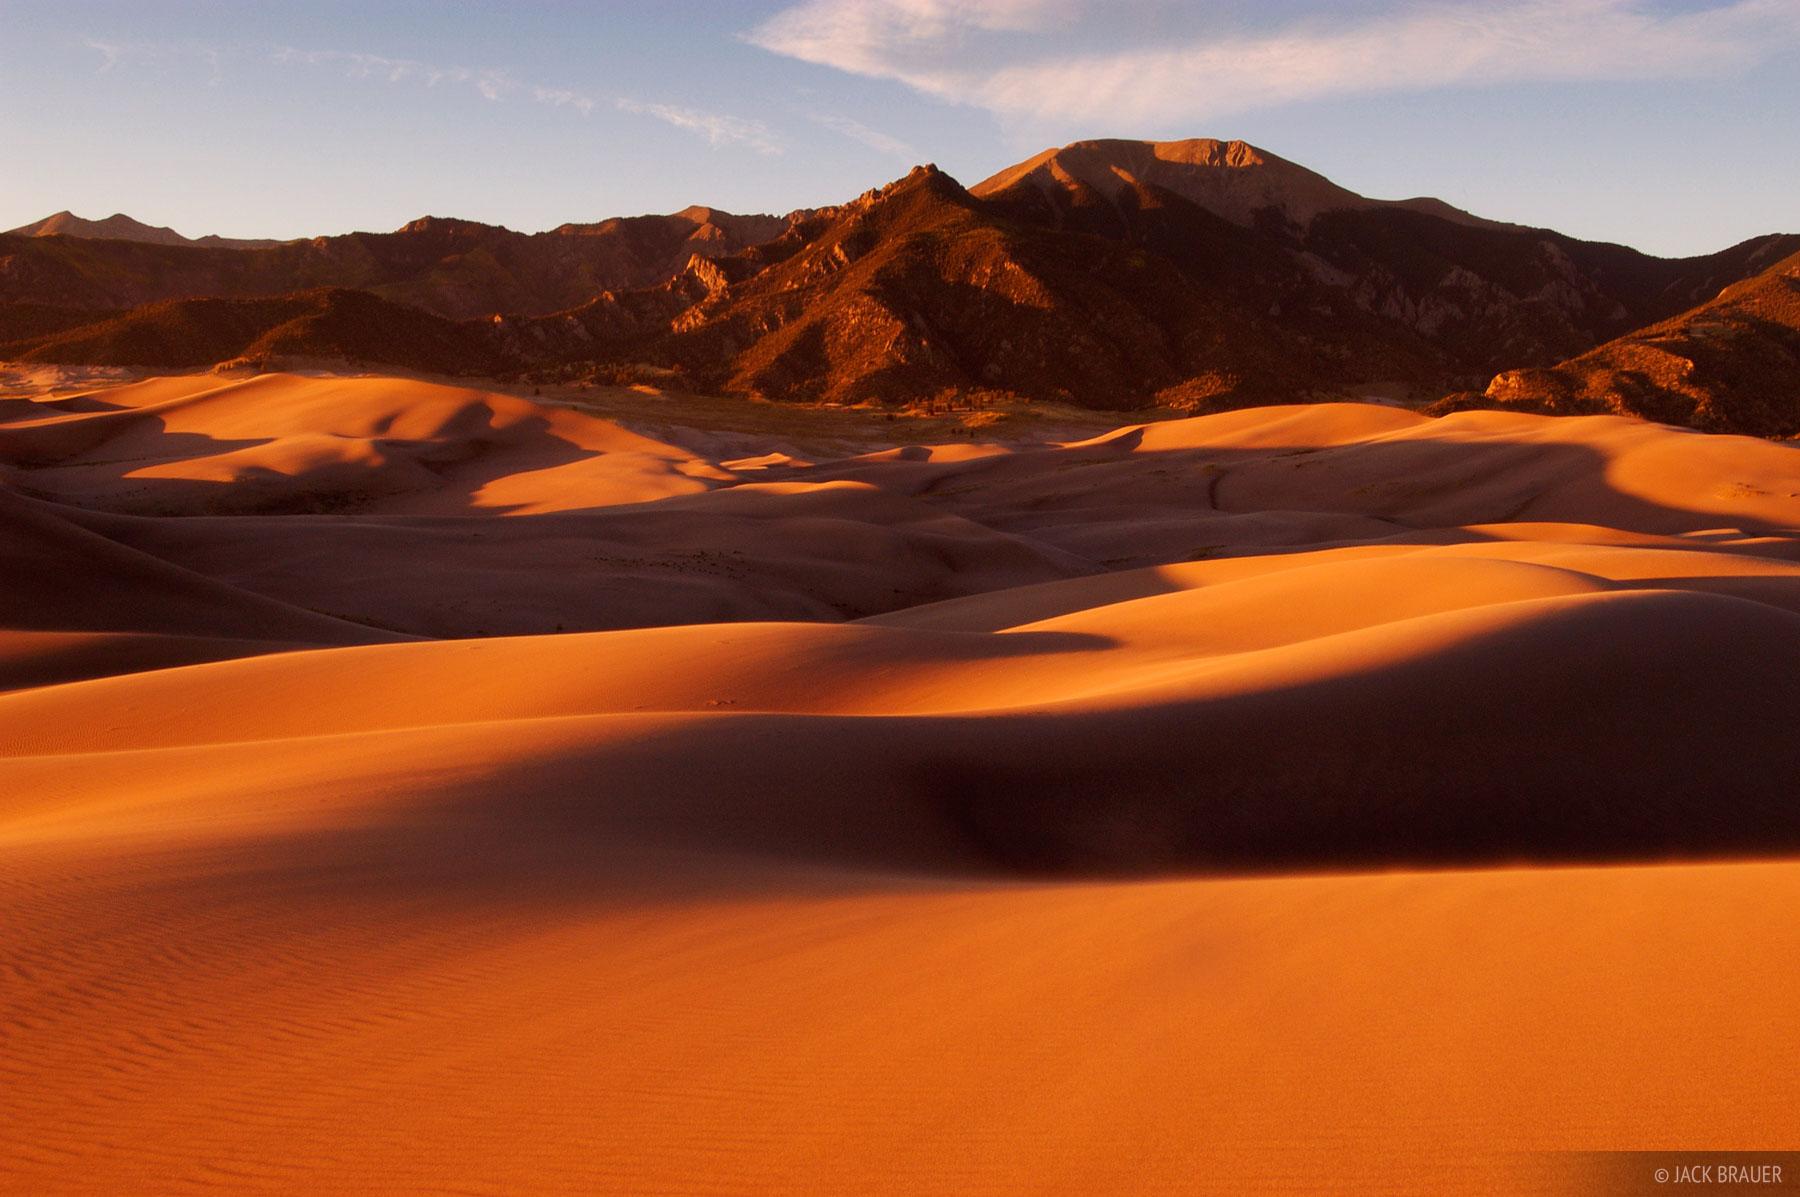 sunset, Great Sand Dunes, Mount Herard, Sangre de Cristos, Colorado, photo